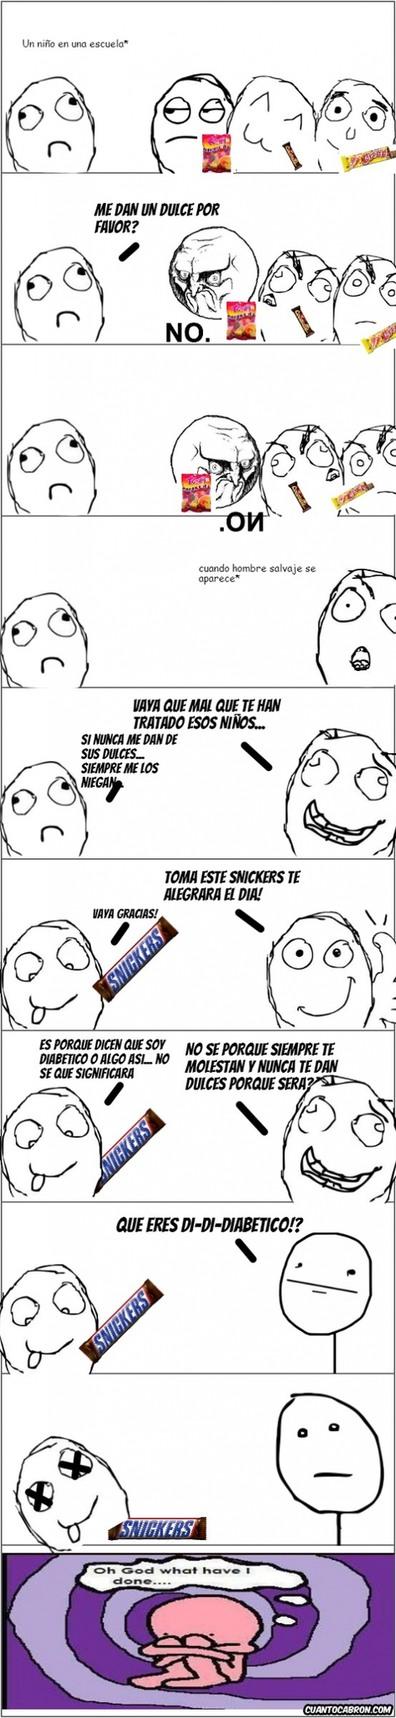 EL NIÑO DIABETICO - meme